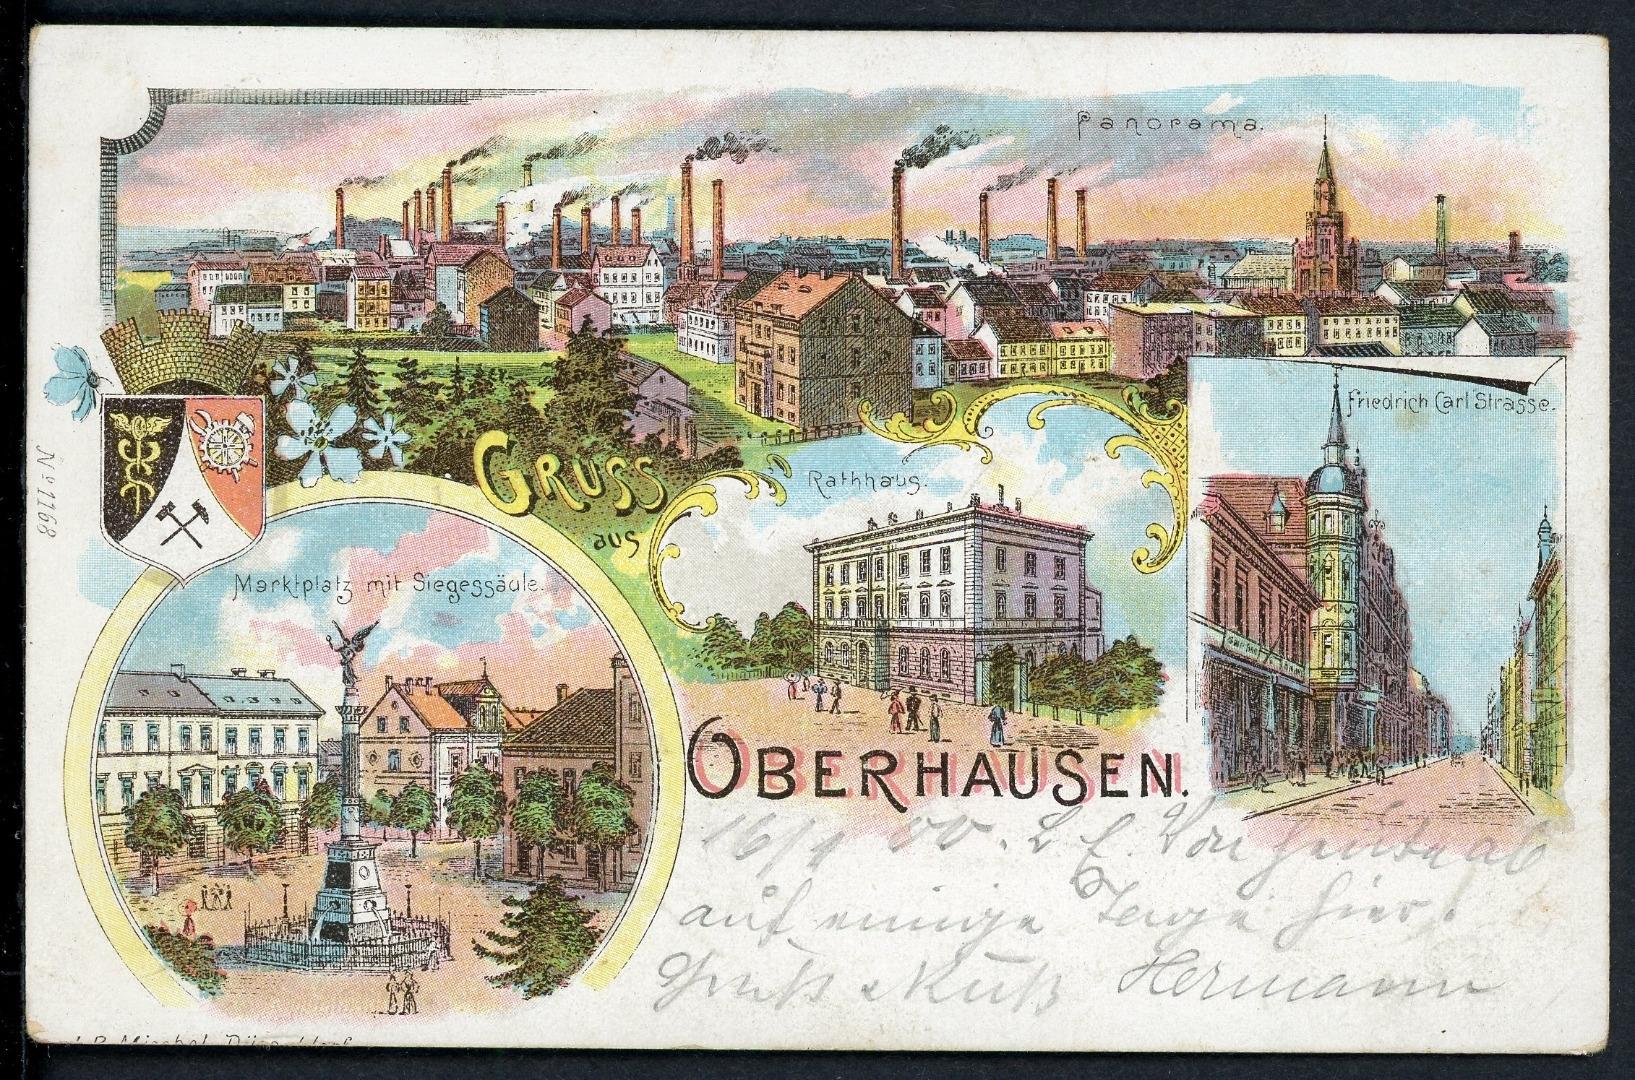 ak oberhausen 1900 marktplatz friedrich carl strasse rathaus aix phila shop. Black Bedroom Furniture Sets. Home Design Ideas